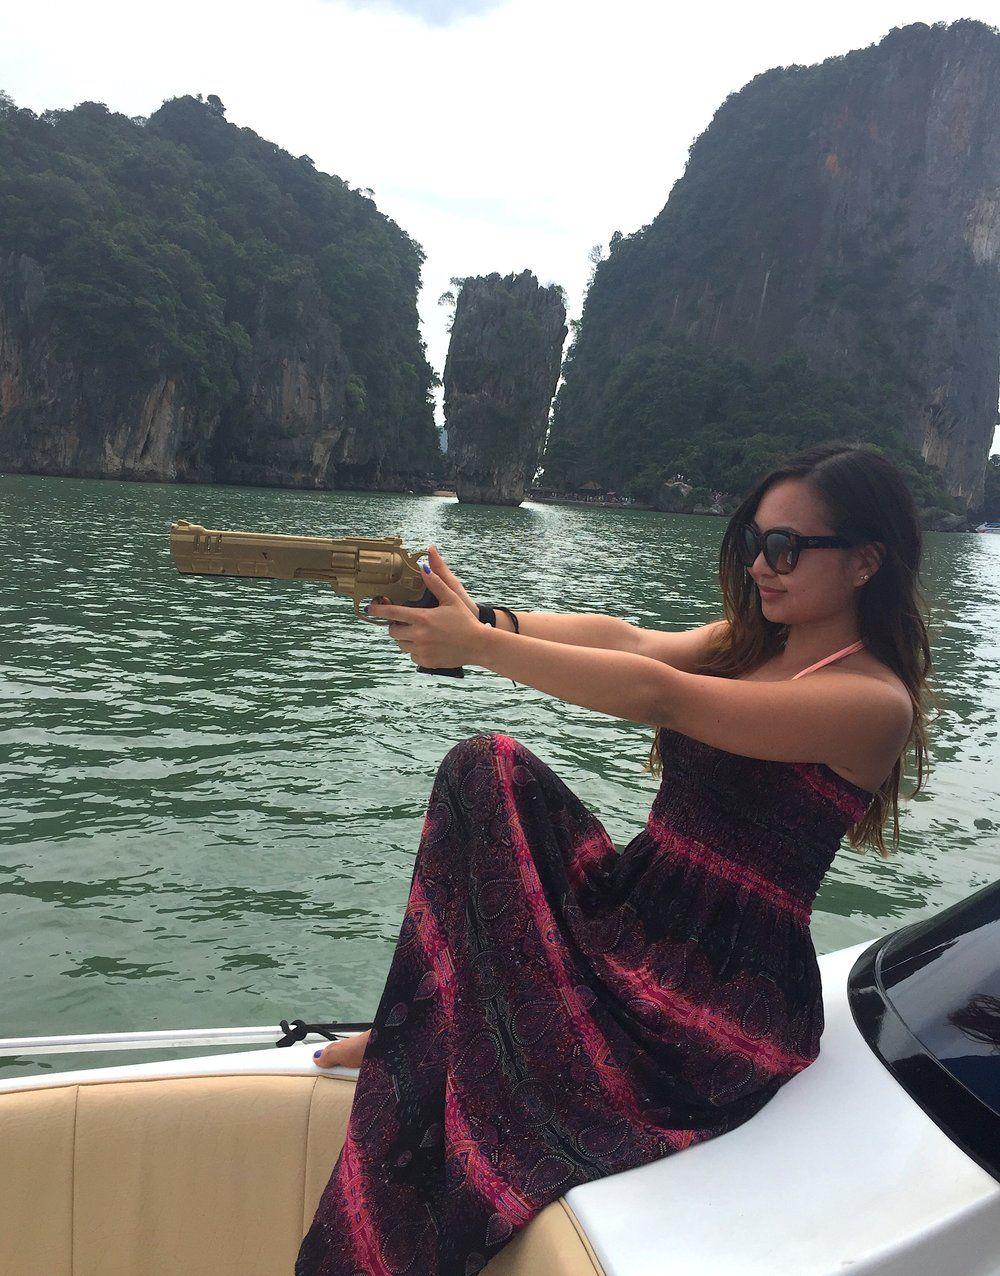 Pin By Em Ho On Travel James Bond Island Thailand Phuket